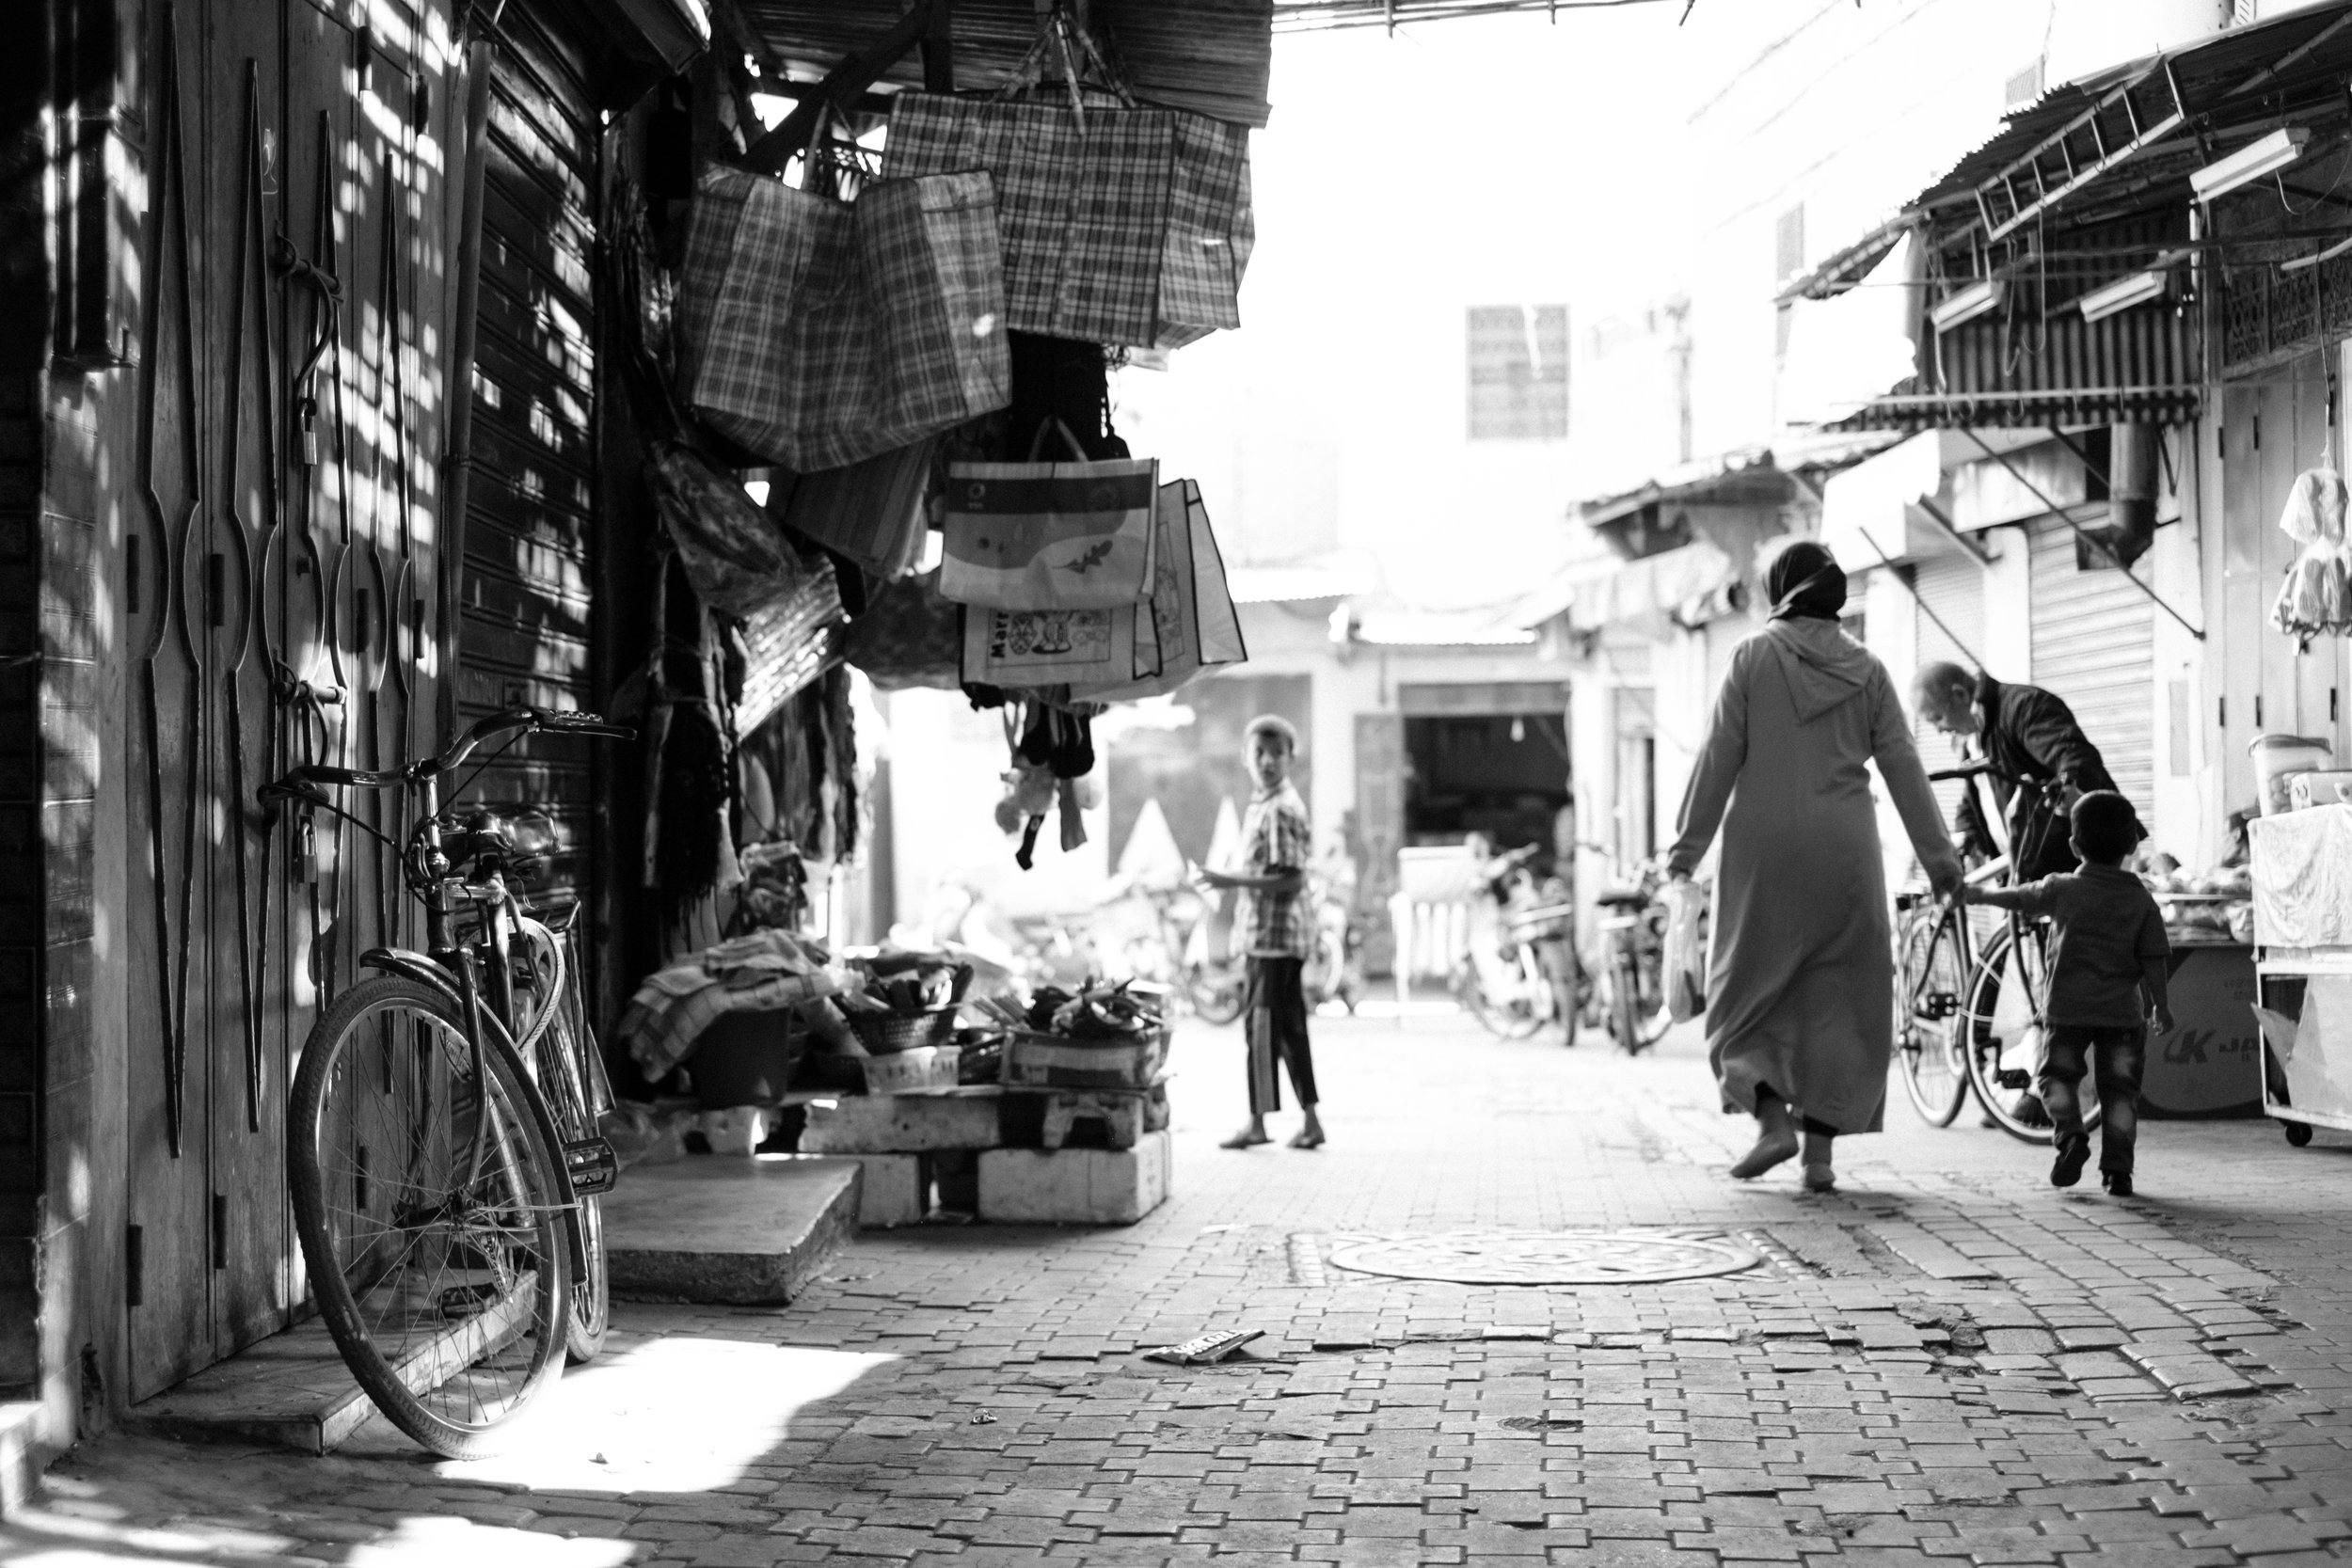 Marrakech,  Morocco , Fujifilm X-Pro2, XF 35mm f/1.4 R @ f/1.6